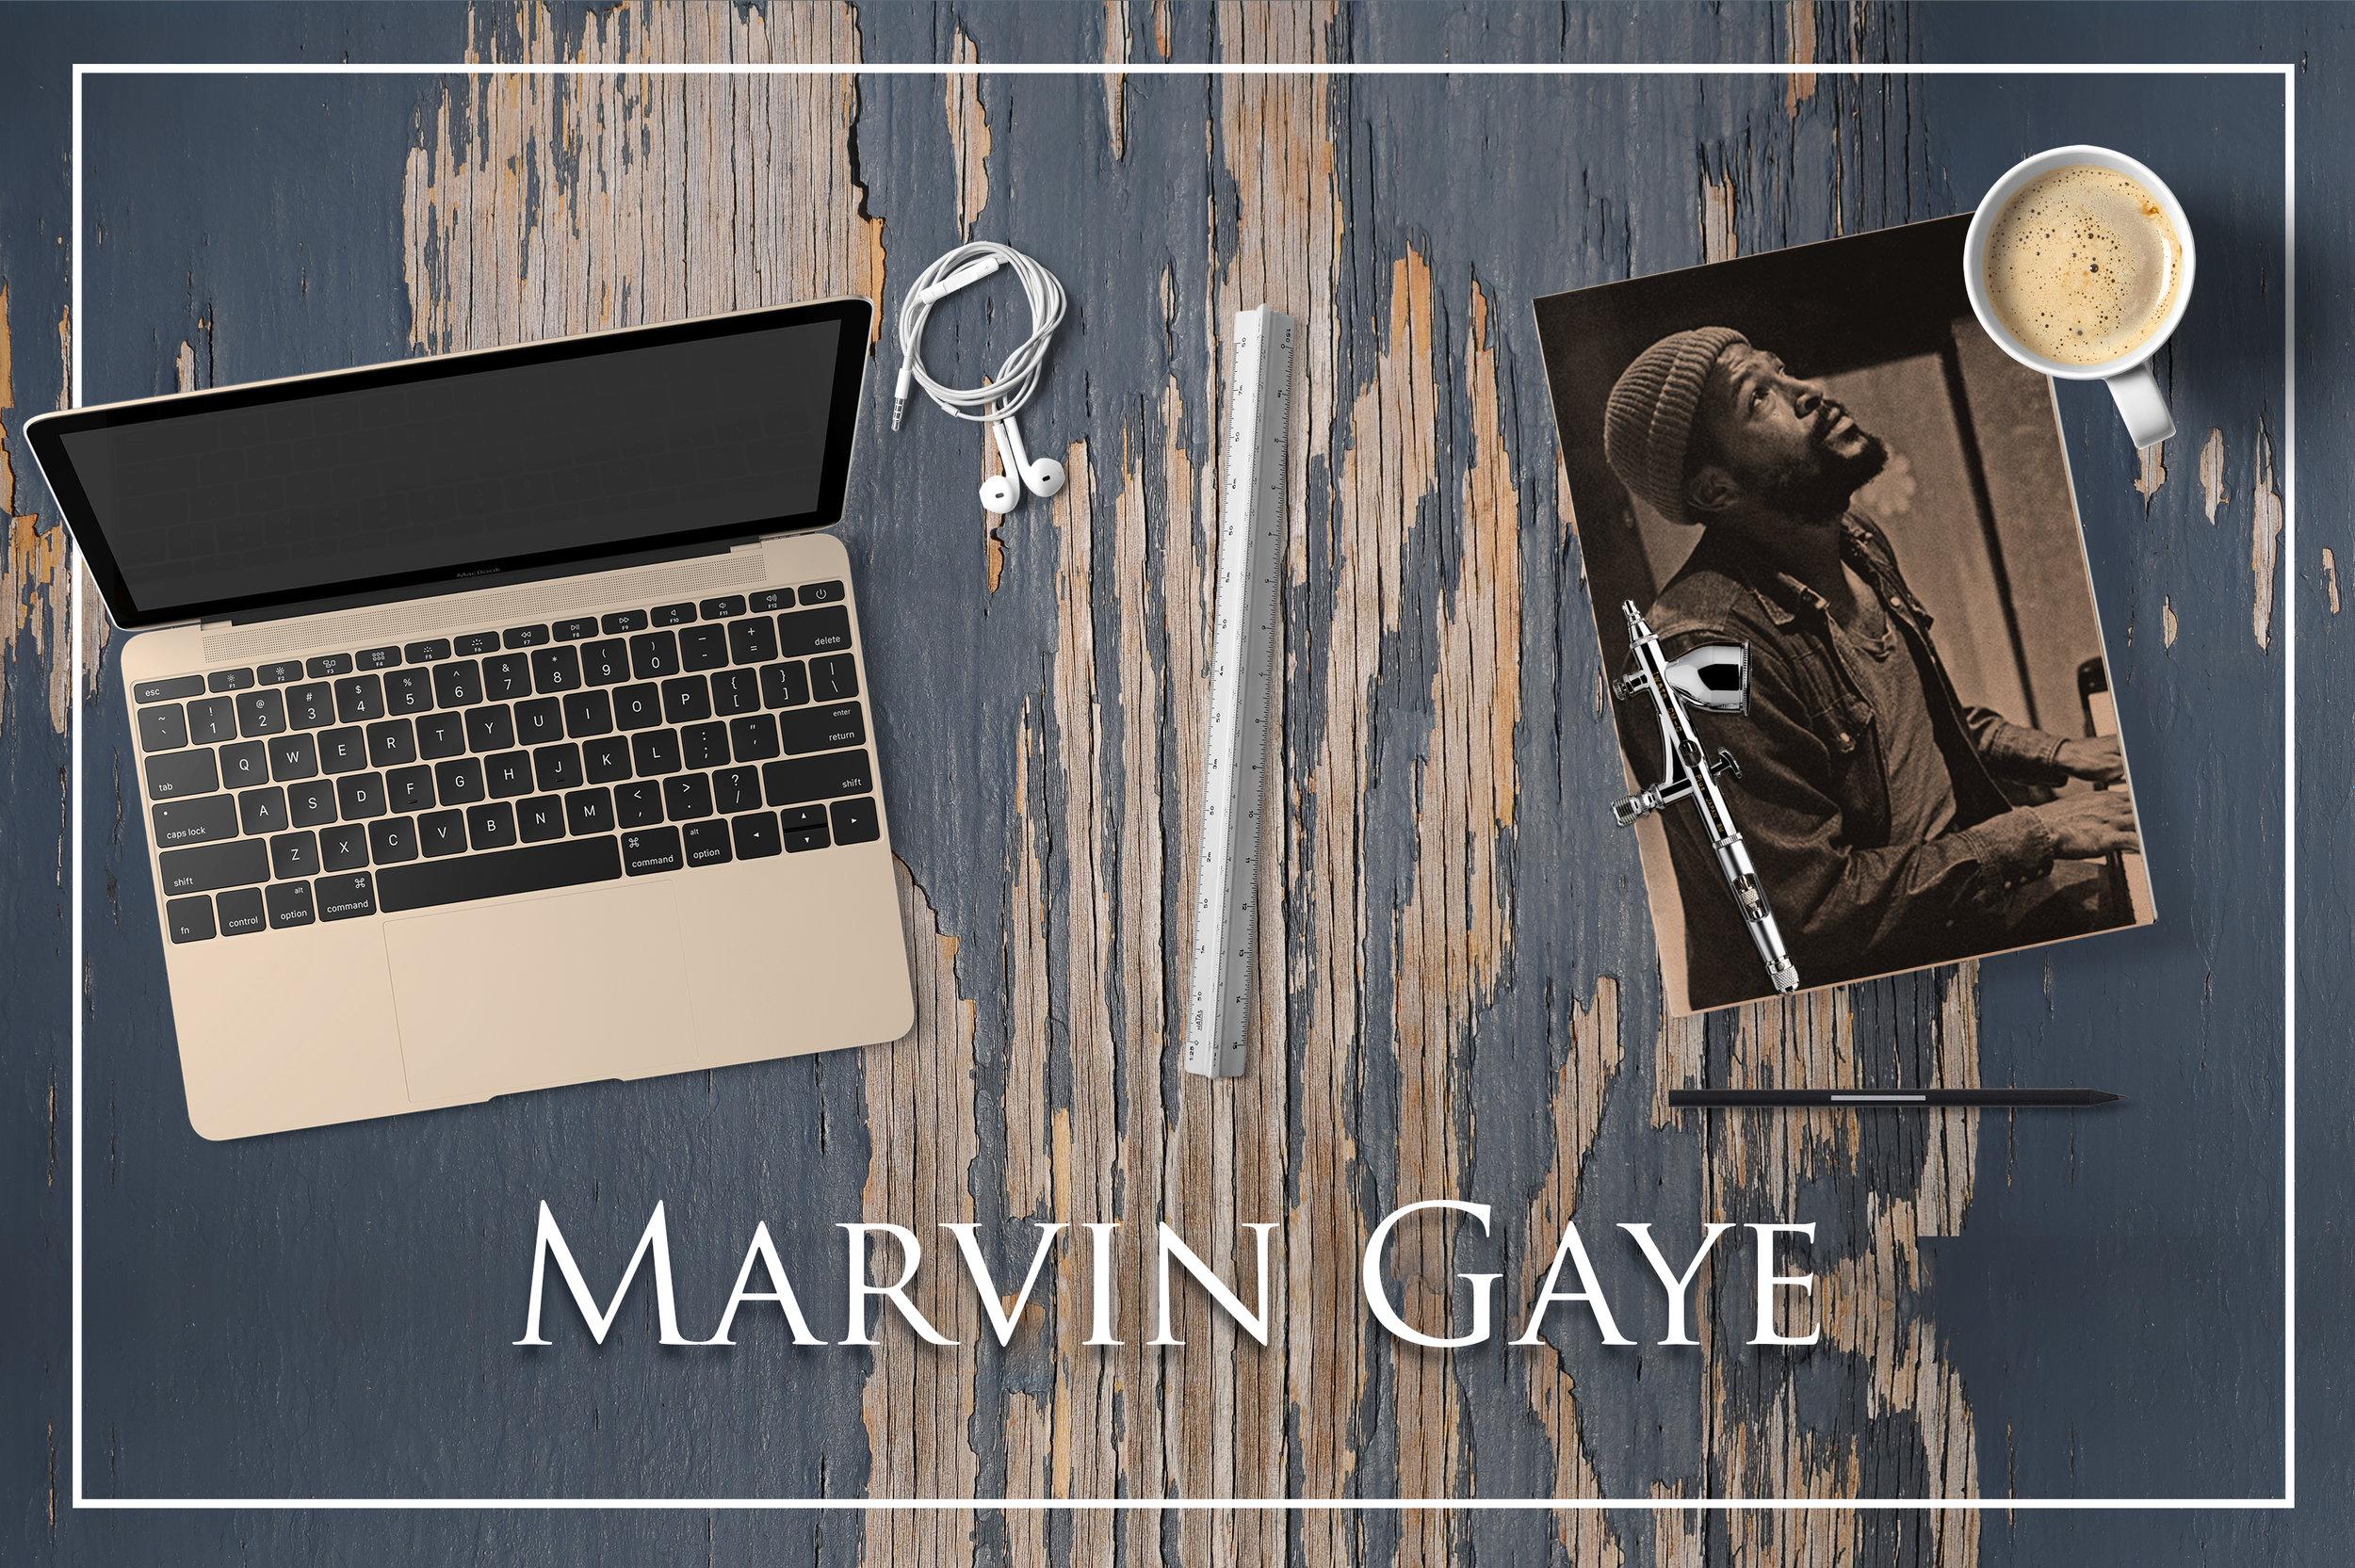 Marvin Gaye Mockup.jpg